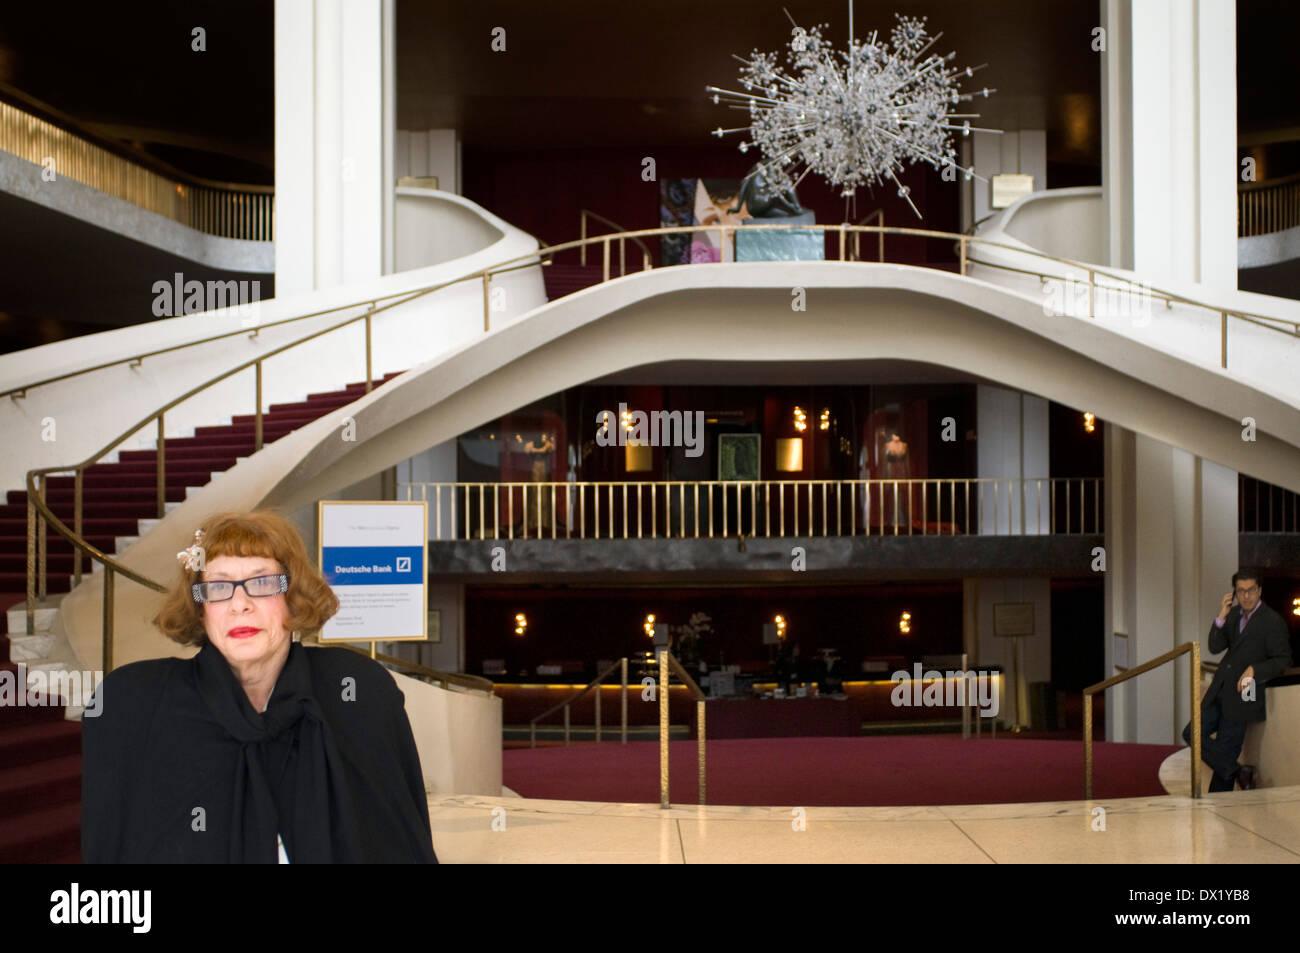 Innere des Metropolitan Opera House. New York ist die Stadt, die ...